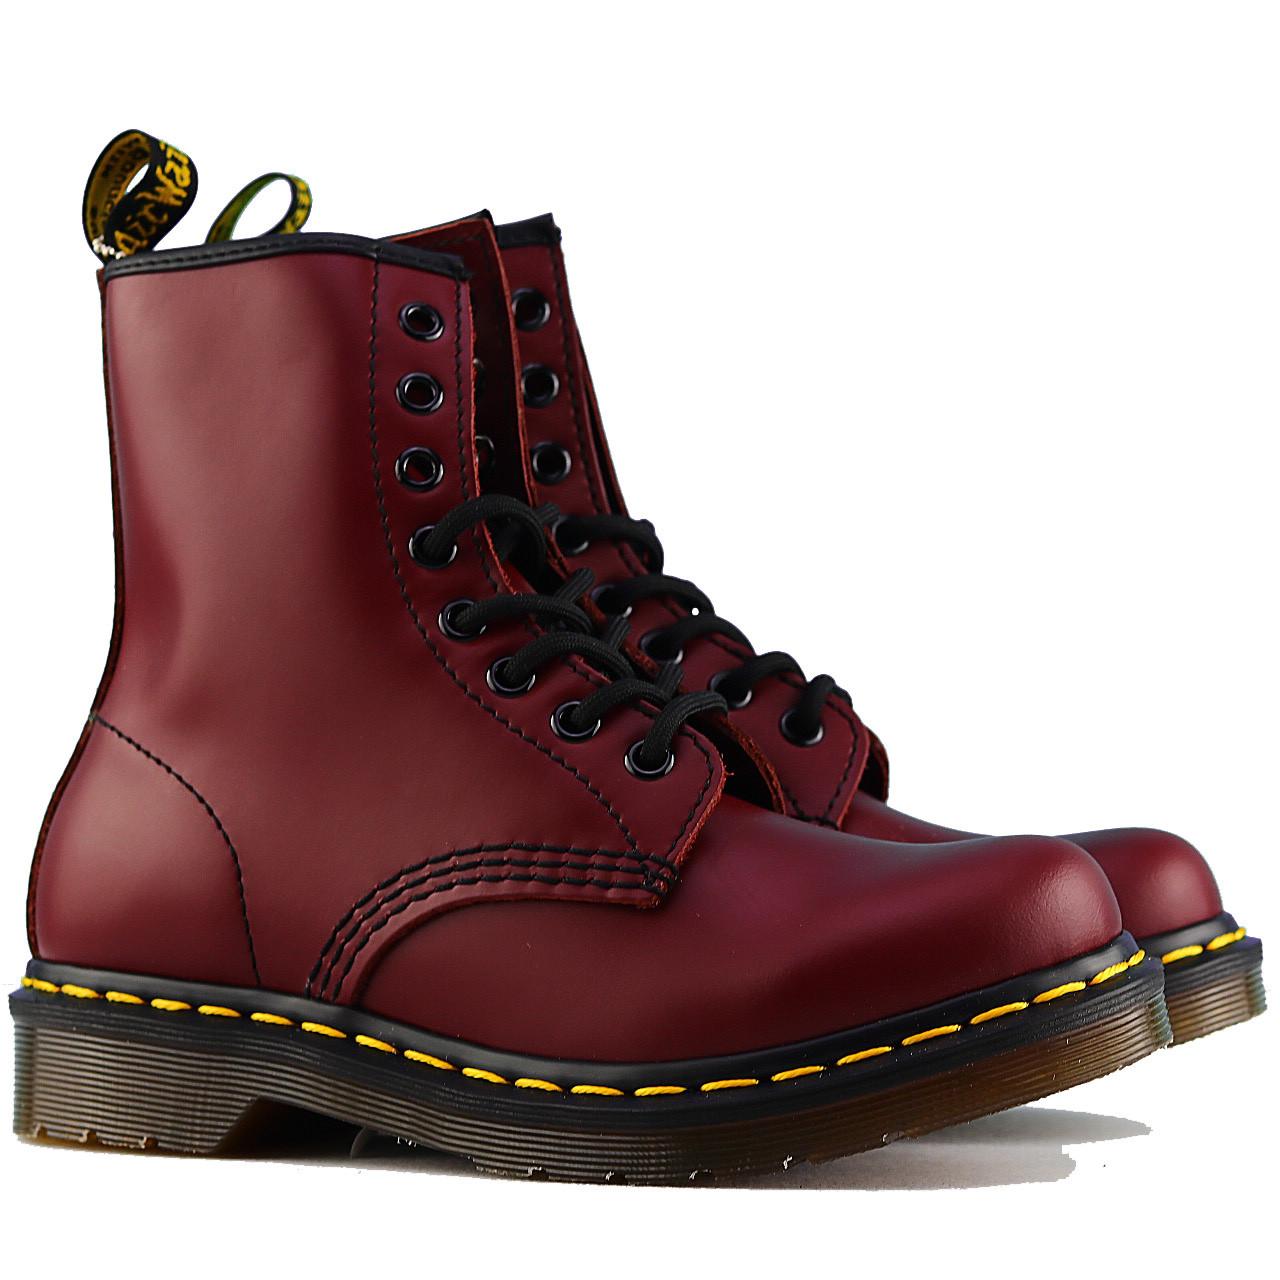 Ботинки Dr. Martens Boots Cherry Red Smooth (реплика)